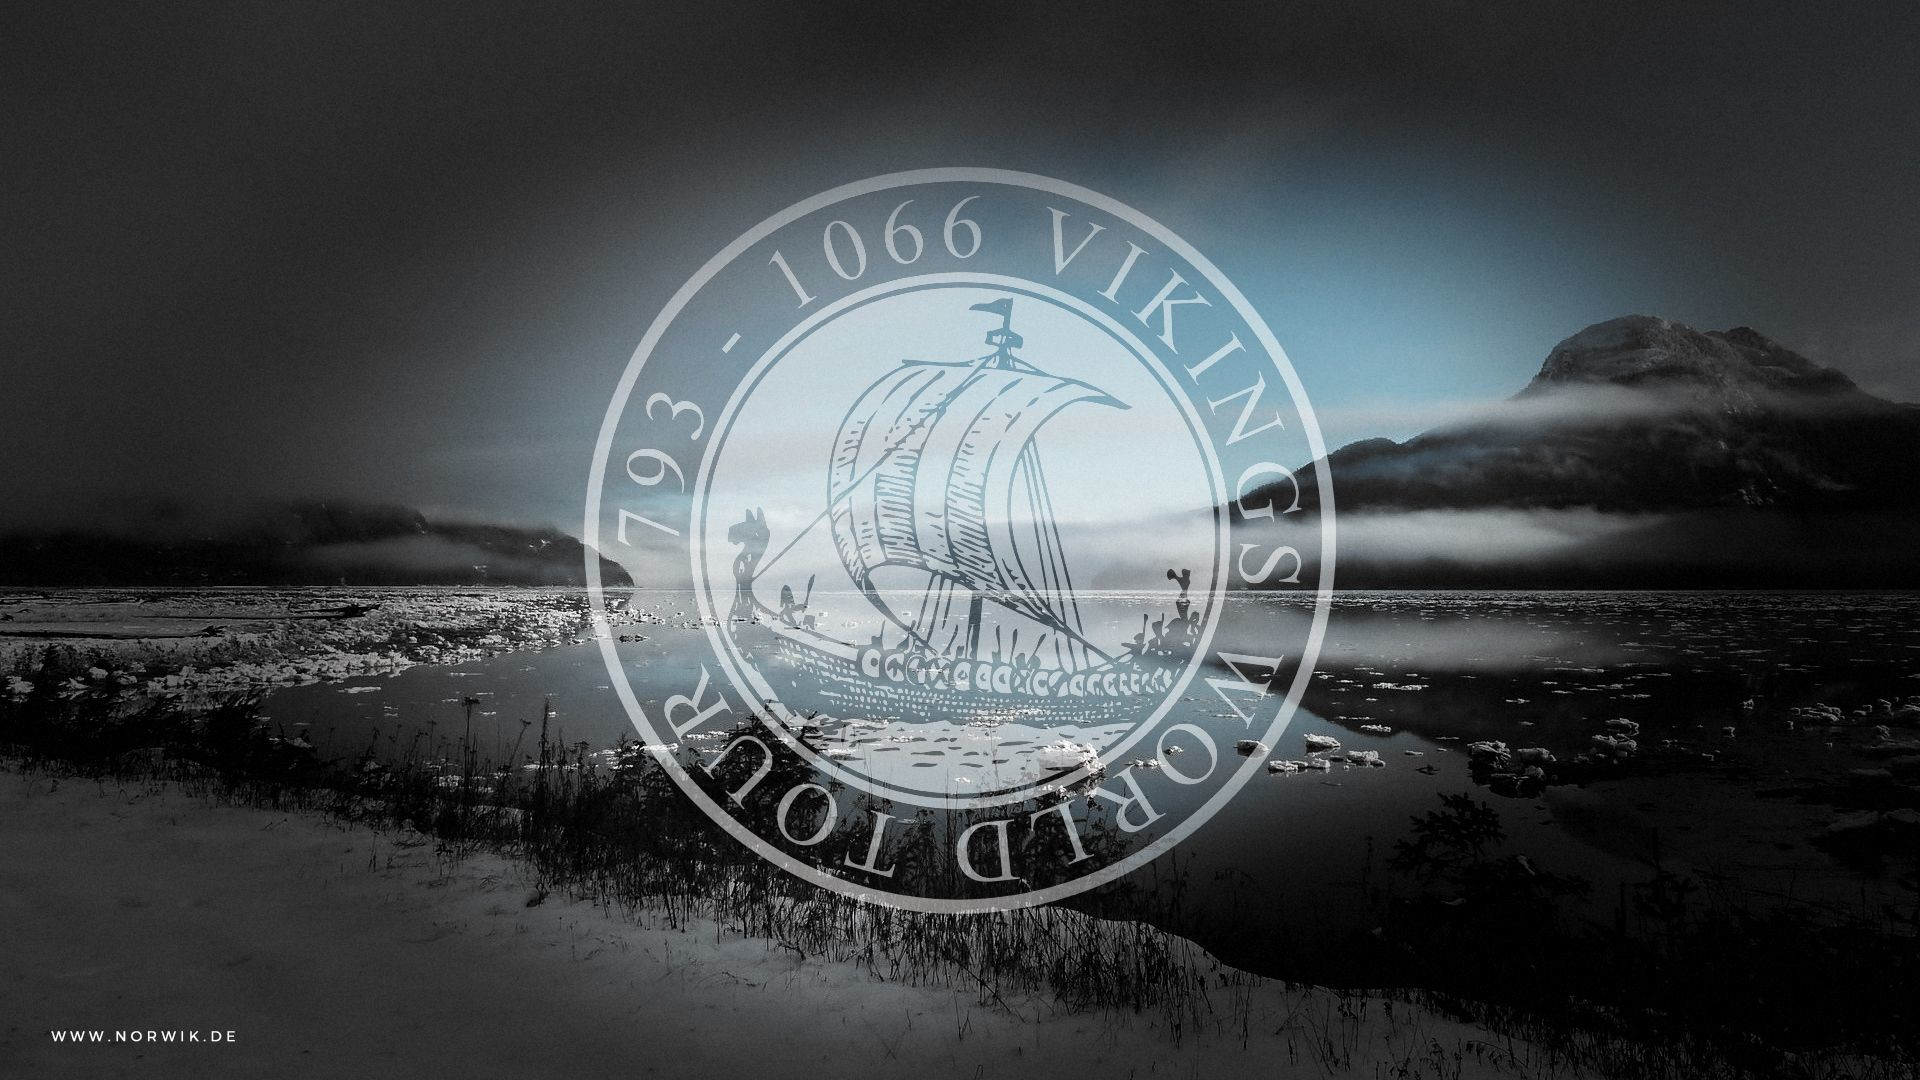 Res: 1920x1080, vikings world tour wikinger hd wallpaper thumb